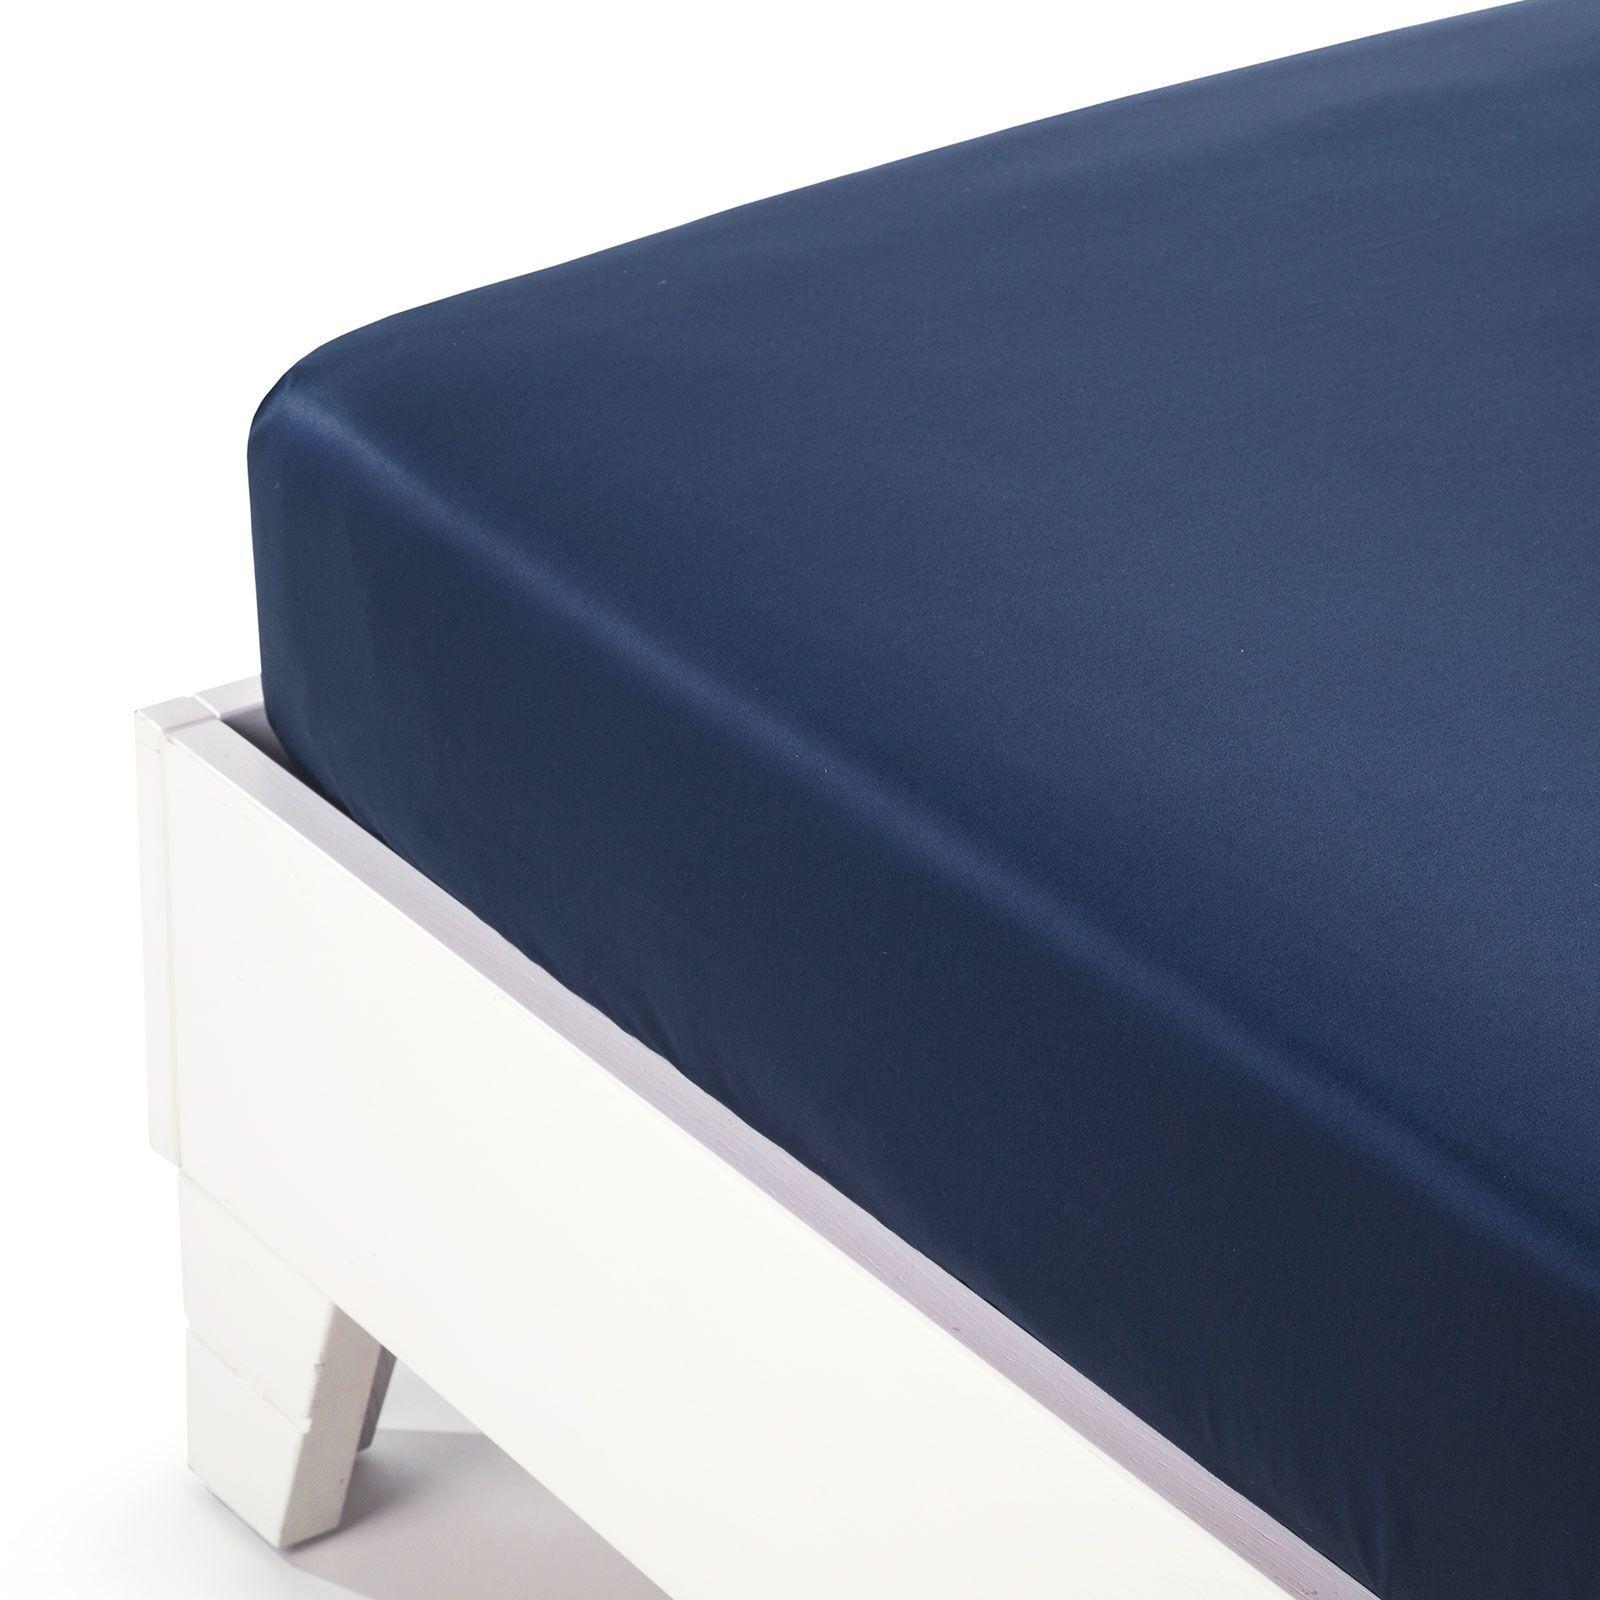 На резинке Простыня на резинке 200x200 Сaleffi Raso Tinta Unito с бордюром сатин темно-синяя prostynya-na-rezinke-90x200-saleffi-raso-tinta-unito-satin-blu-italiya.jpg